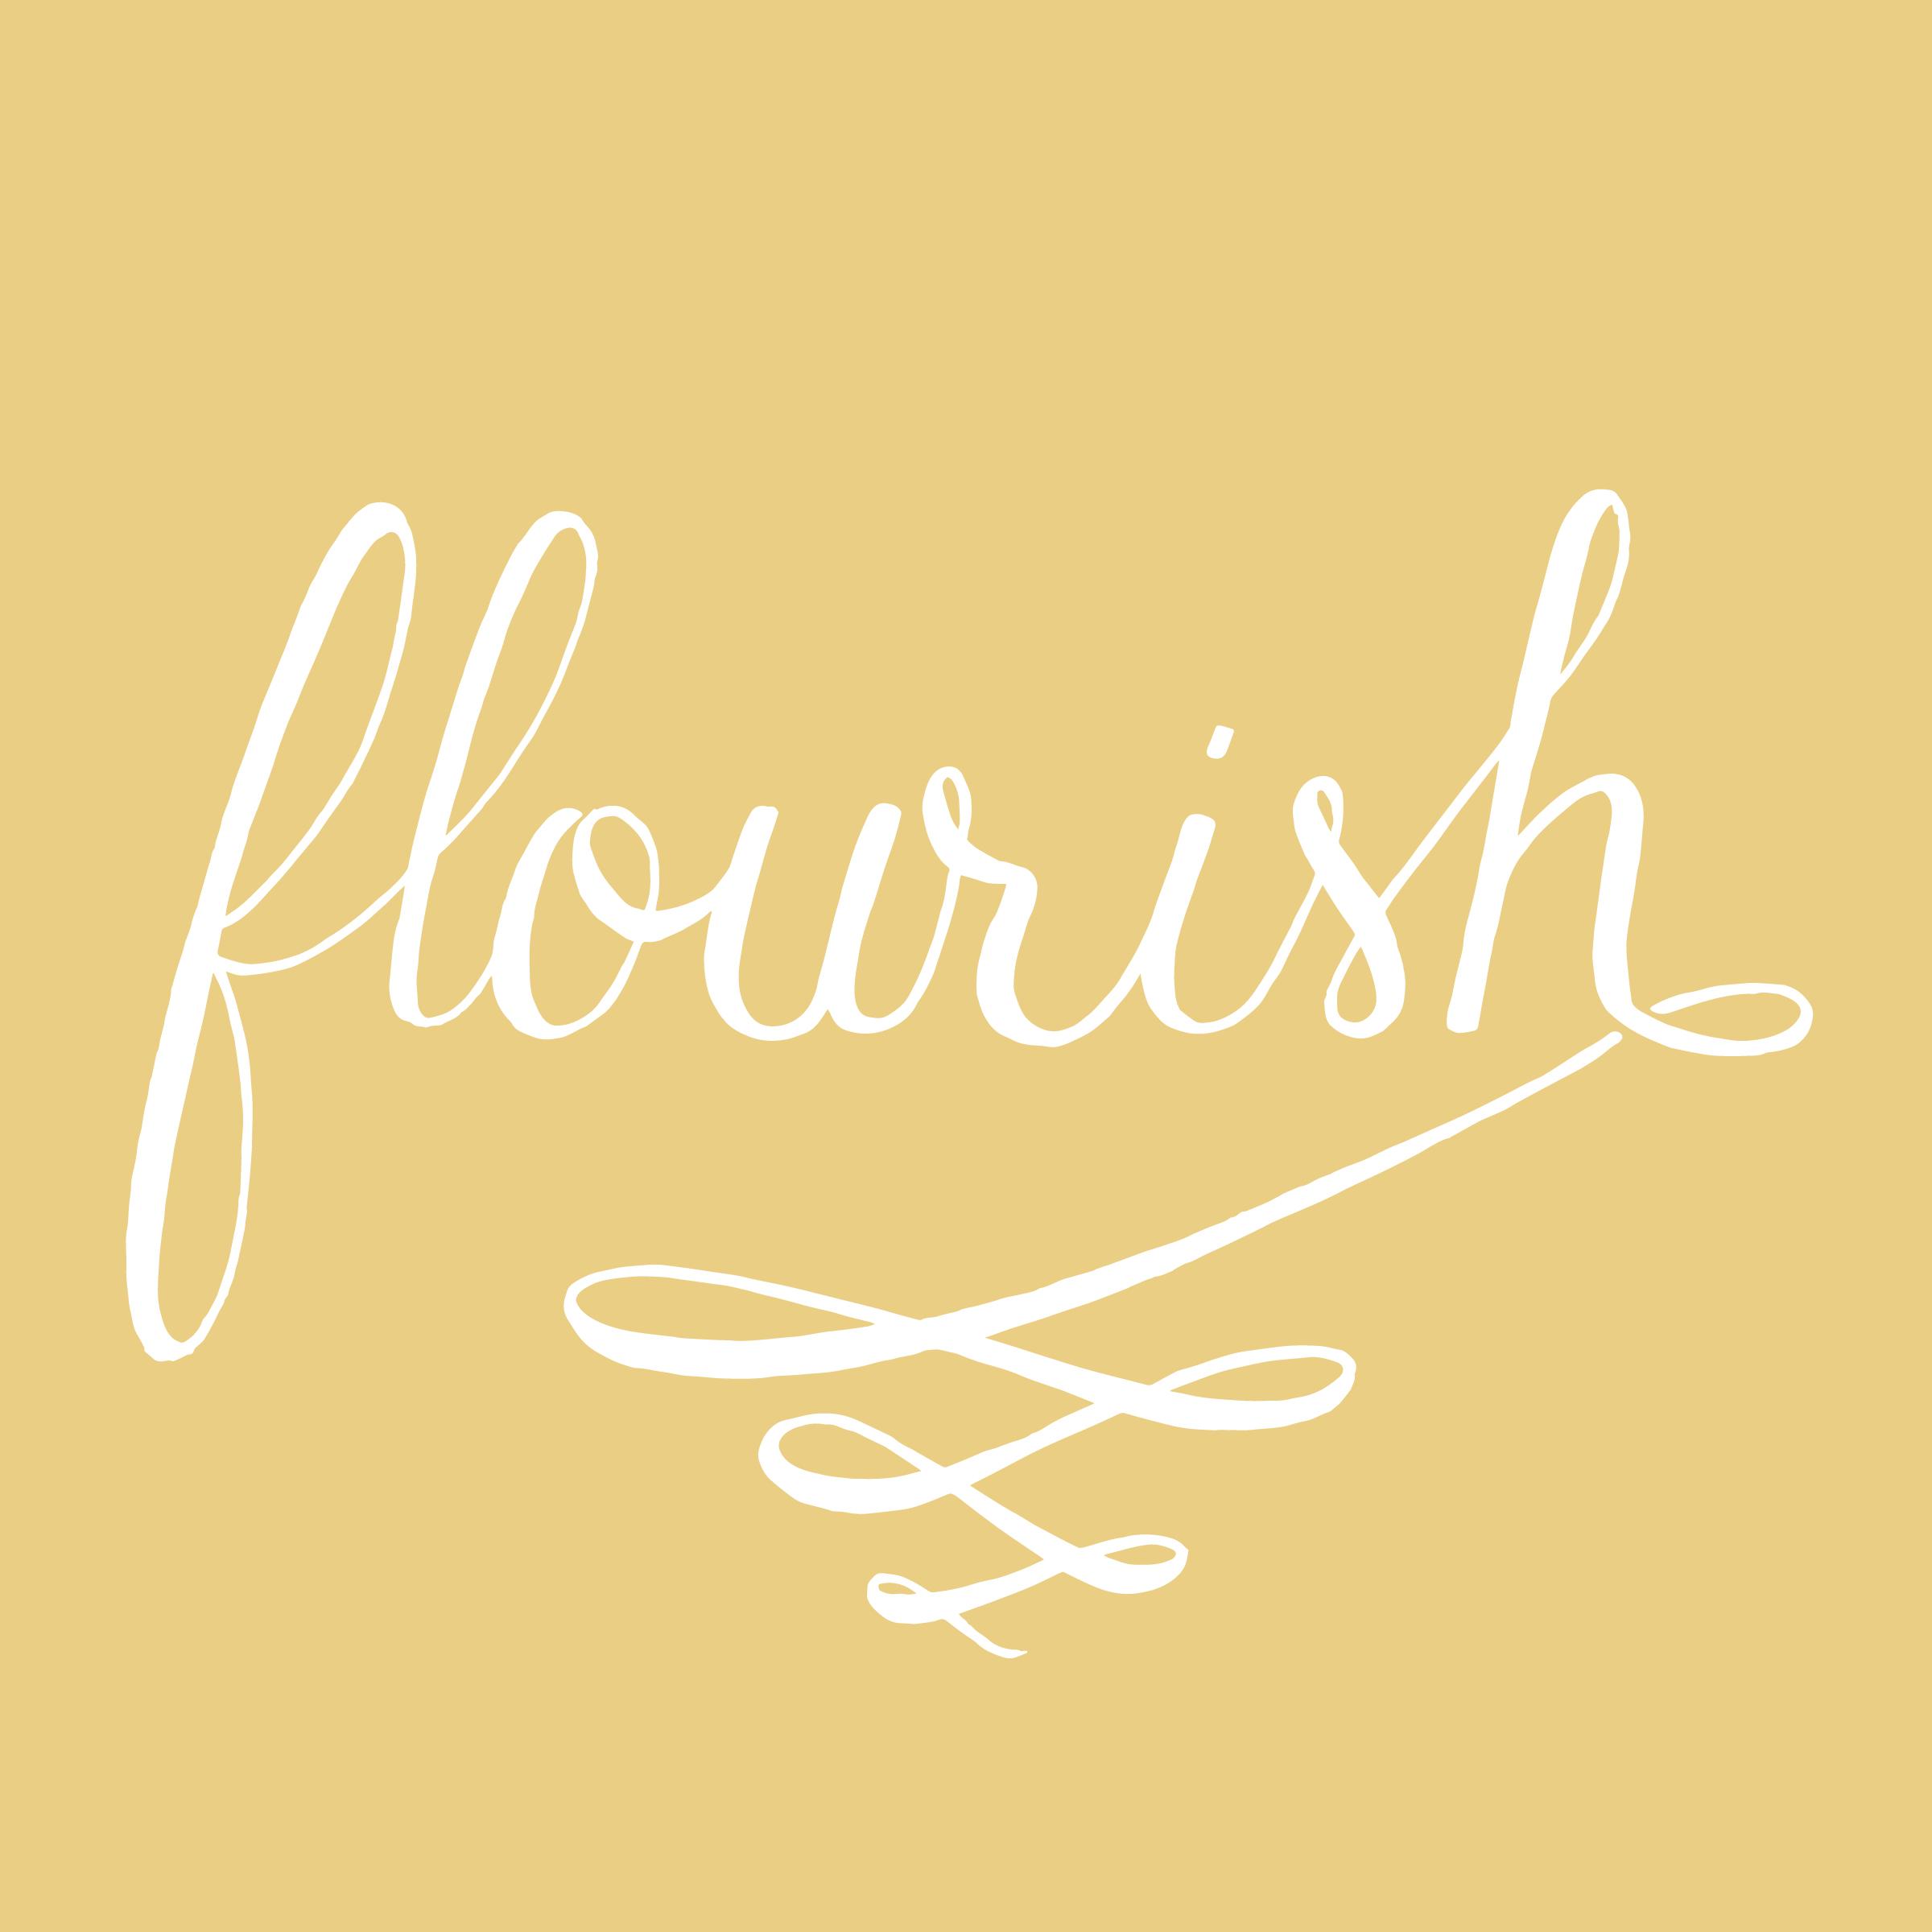 Flourish - andreacrofts.com.jpg